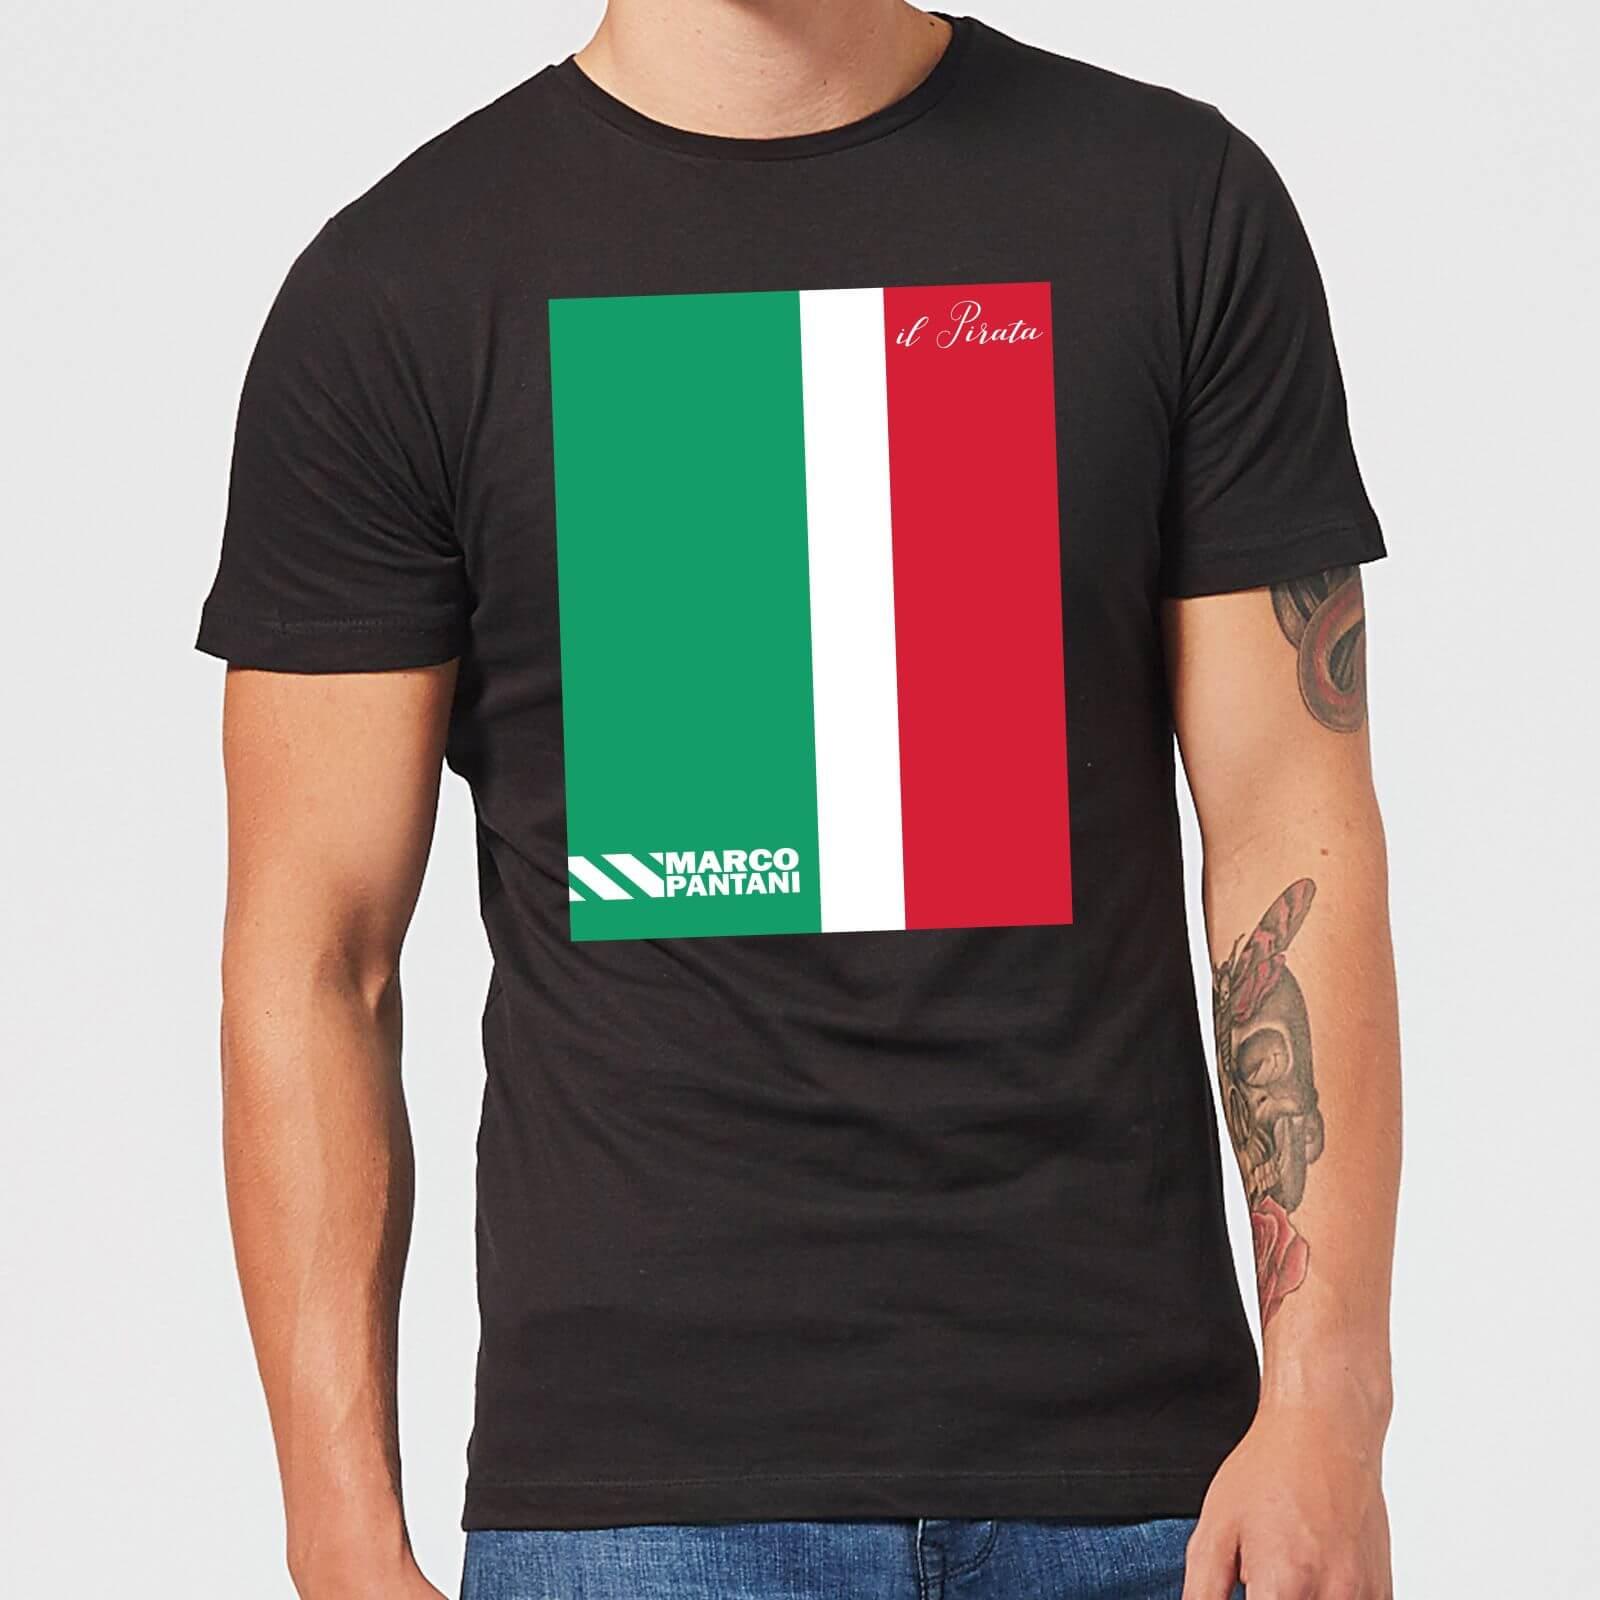 Summit Finish Pantani Il Pirata Men's T-Shirt - Black - 3XL - Black